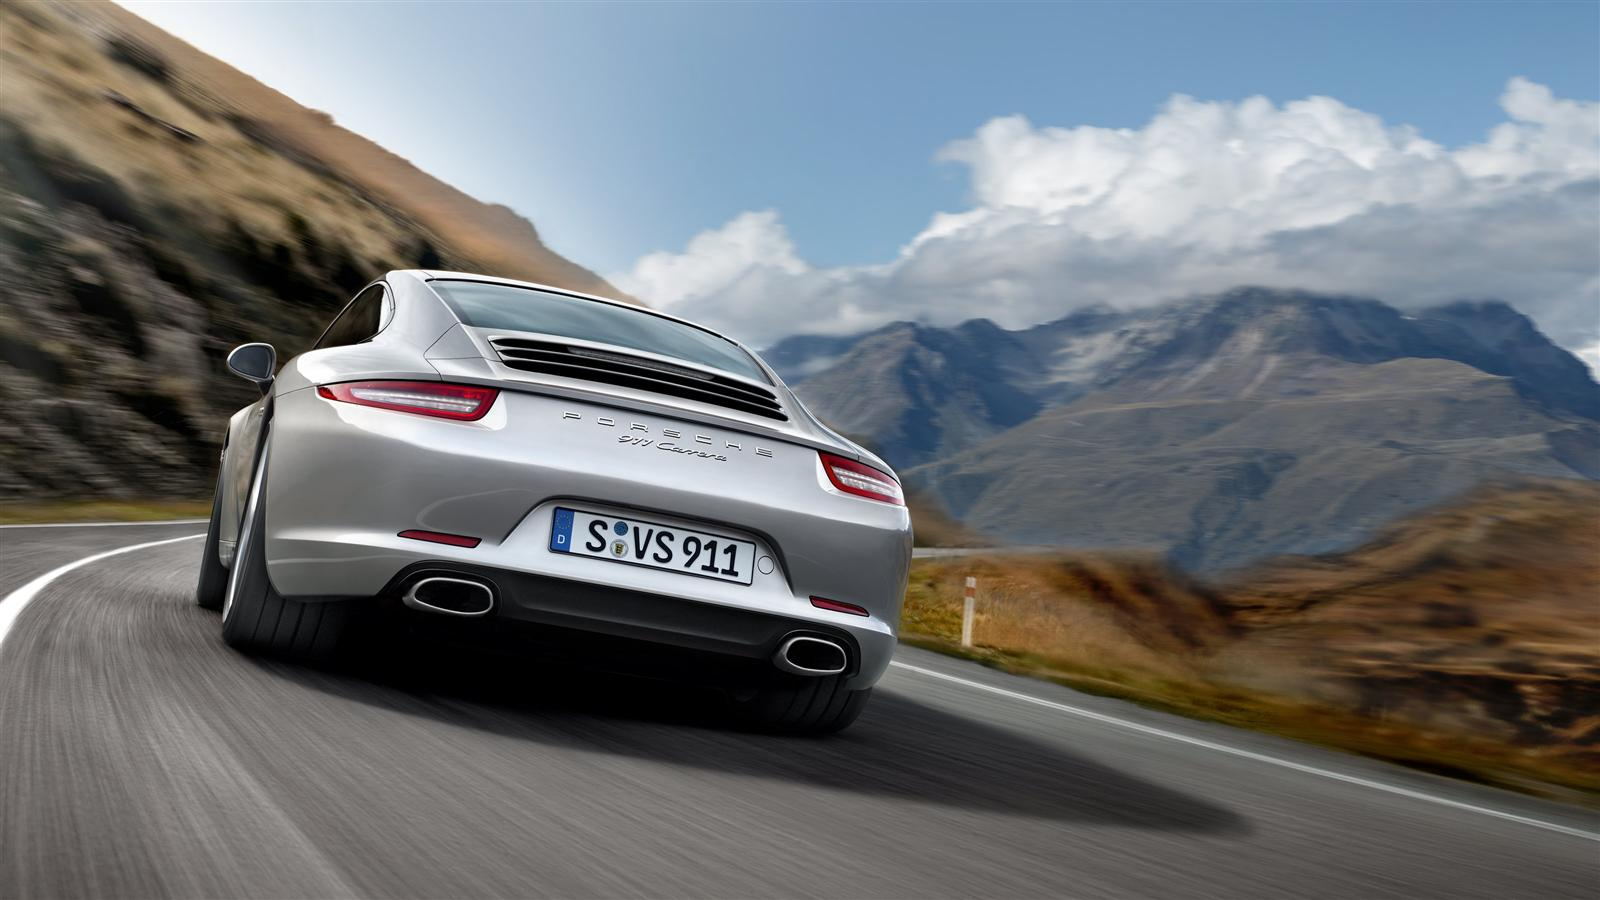 Porsche 911 Carrera /usite/1132/images/911_gal8.jpg